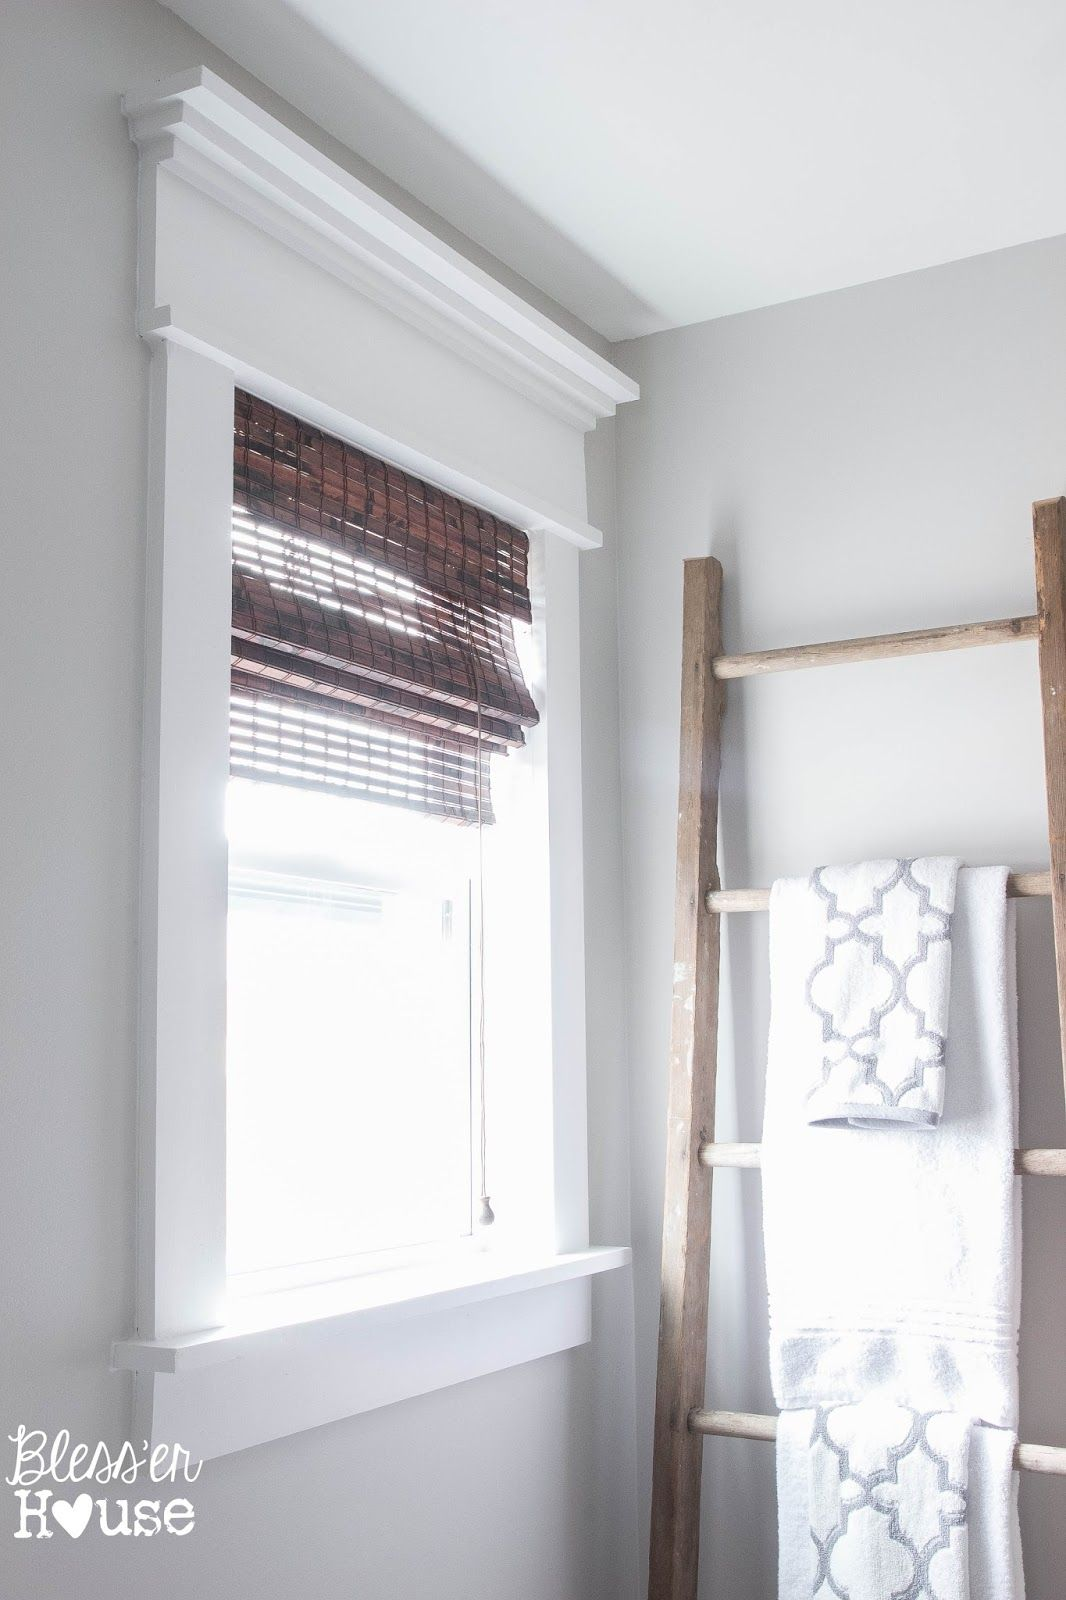 Simple interior window trim ideas - 2 Simple Steps To Upgrade A Basic Window